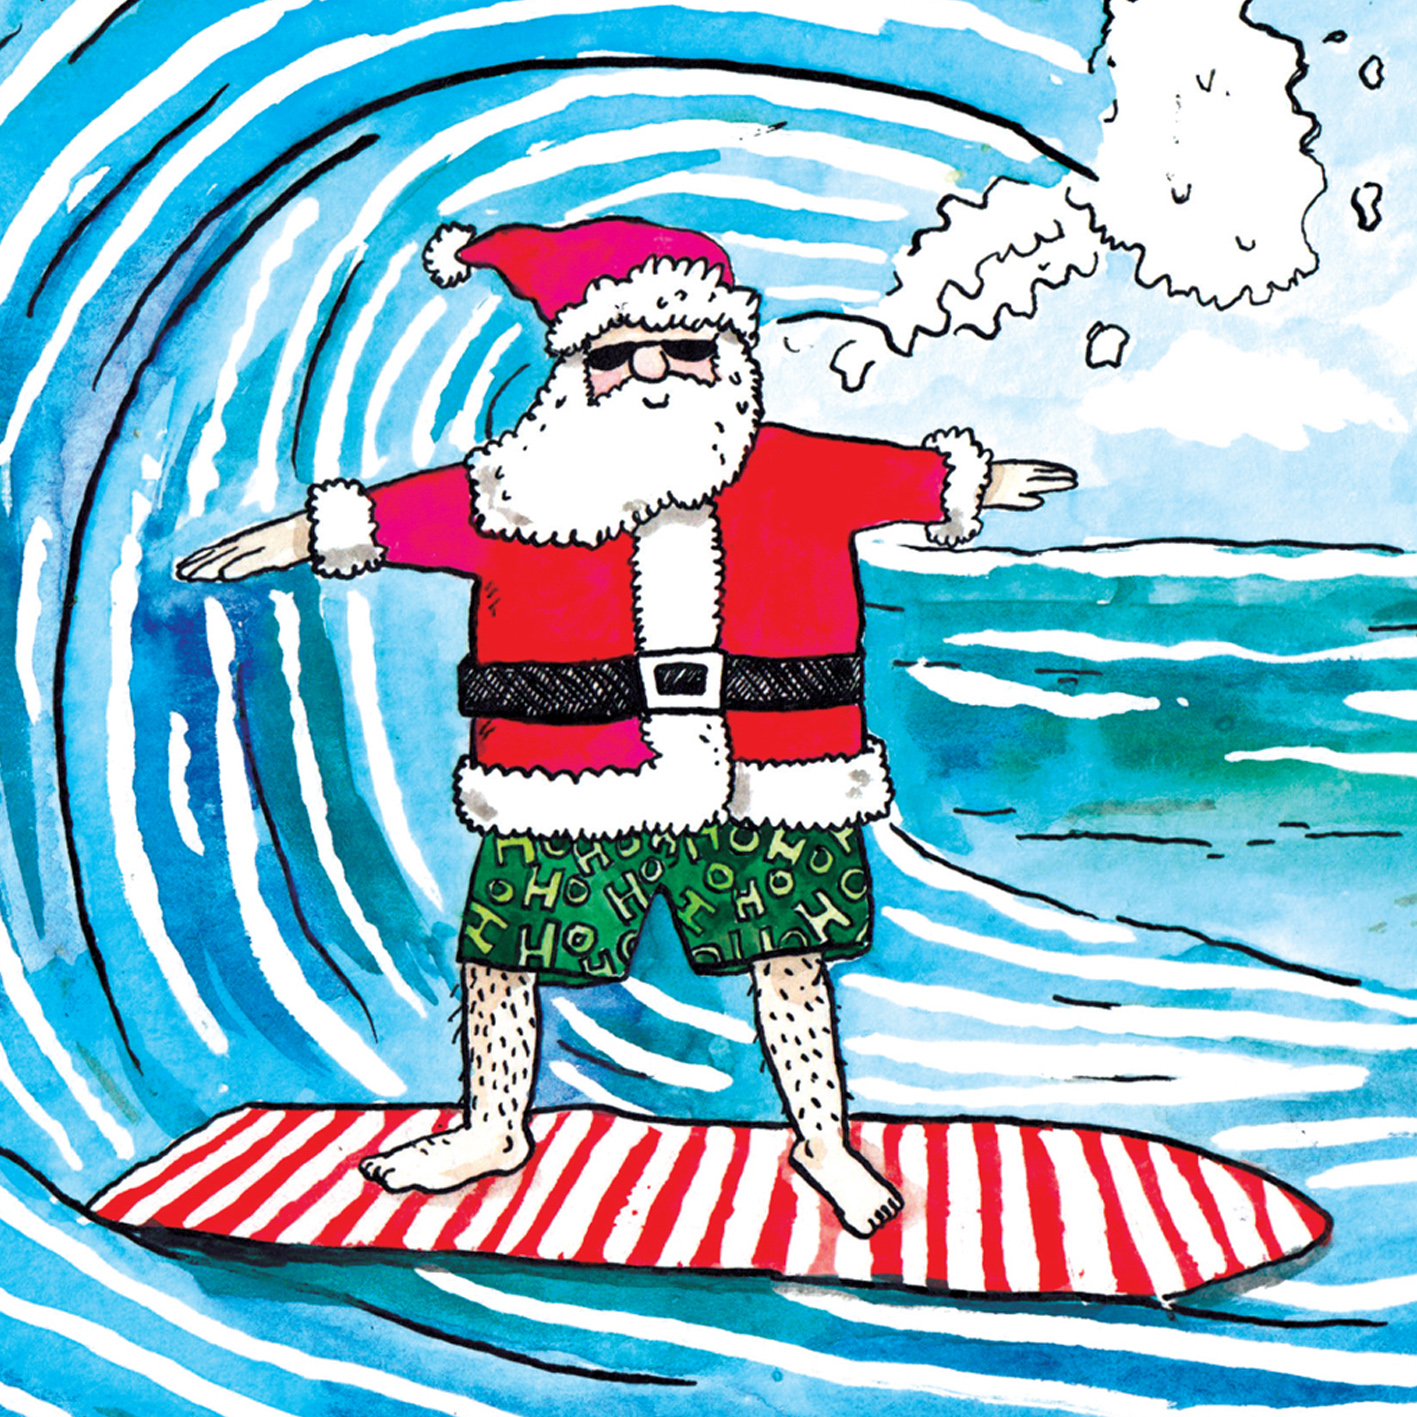 Yule-Tide-Surfing_Surfing-Santa-Christmas-card.-Beach-themed-Christmas-card_CH19_CU